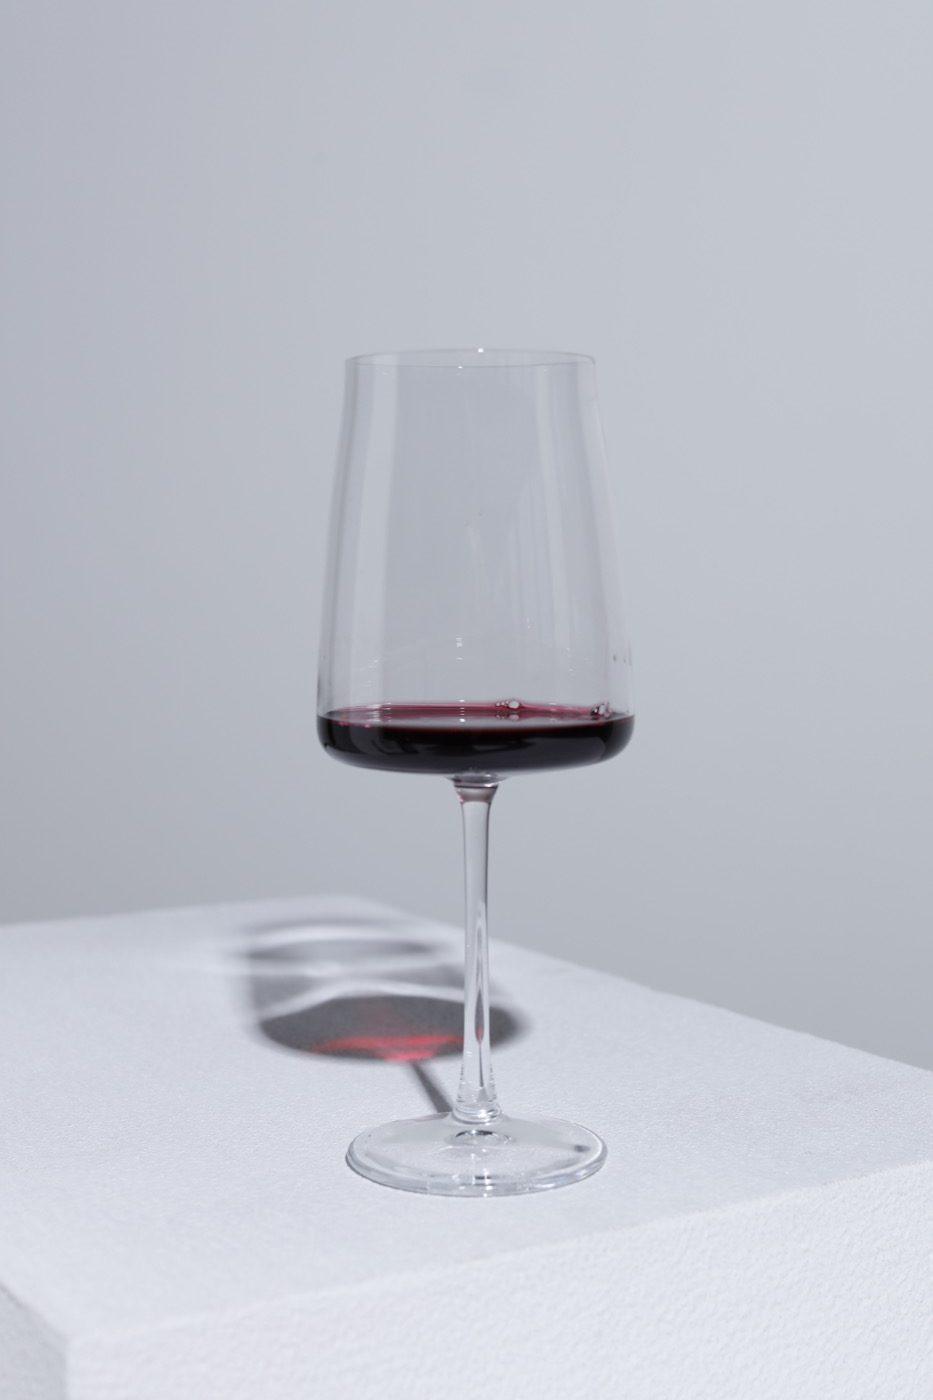 Sauro-Maule-red-wine_DS_7351_1400